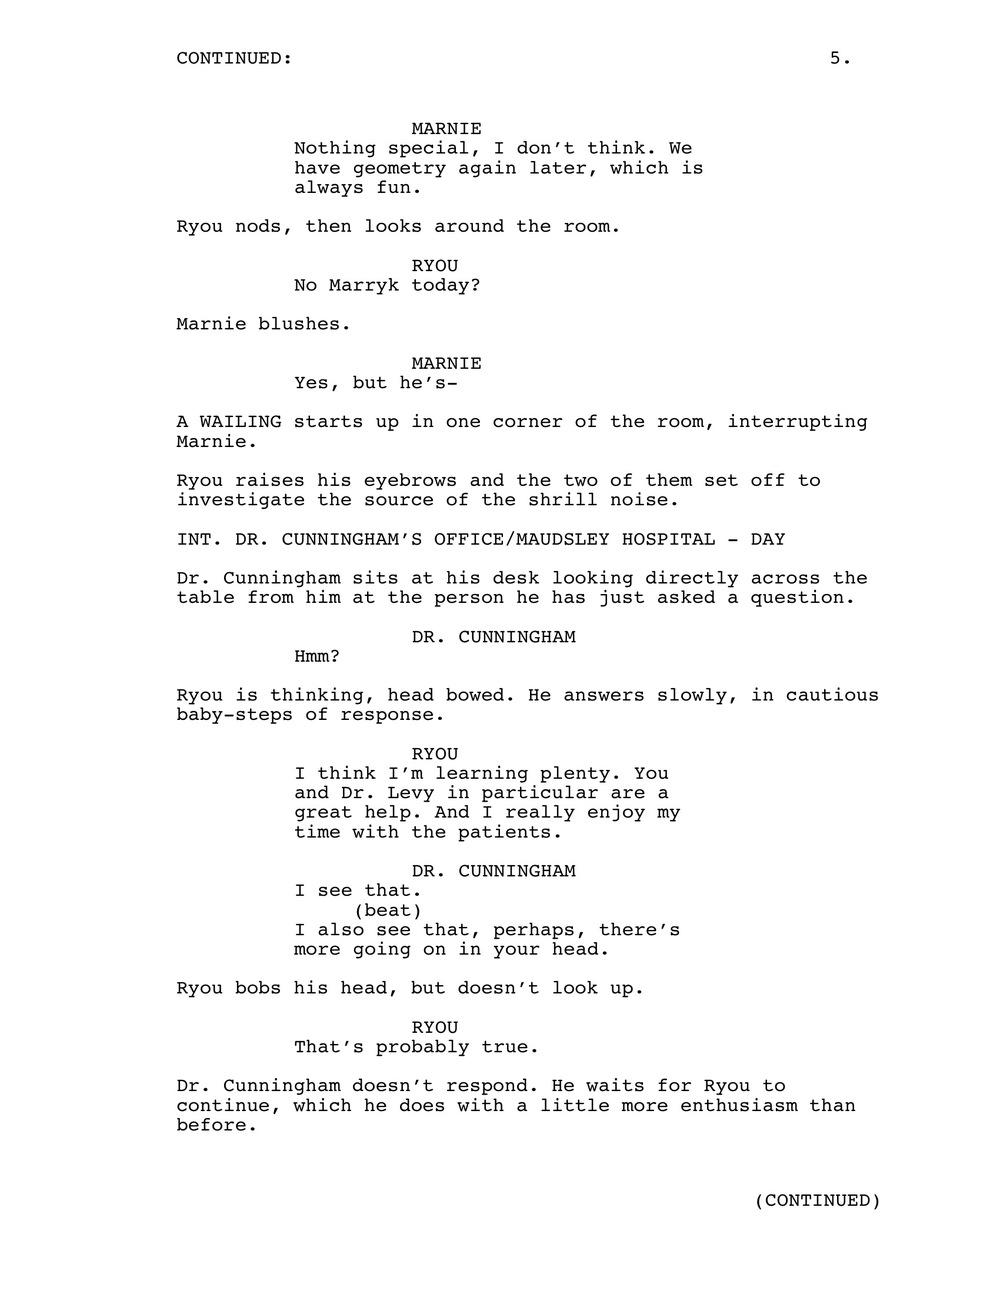 'Introducing Henry Charles' (Pilot) by Alexander Craig | 5.jpeg